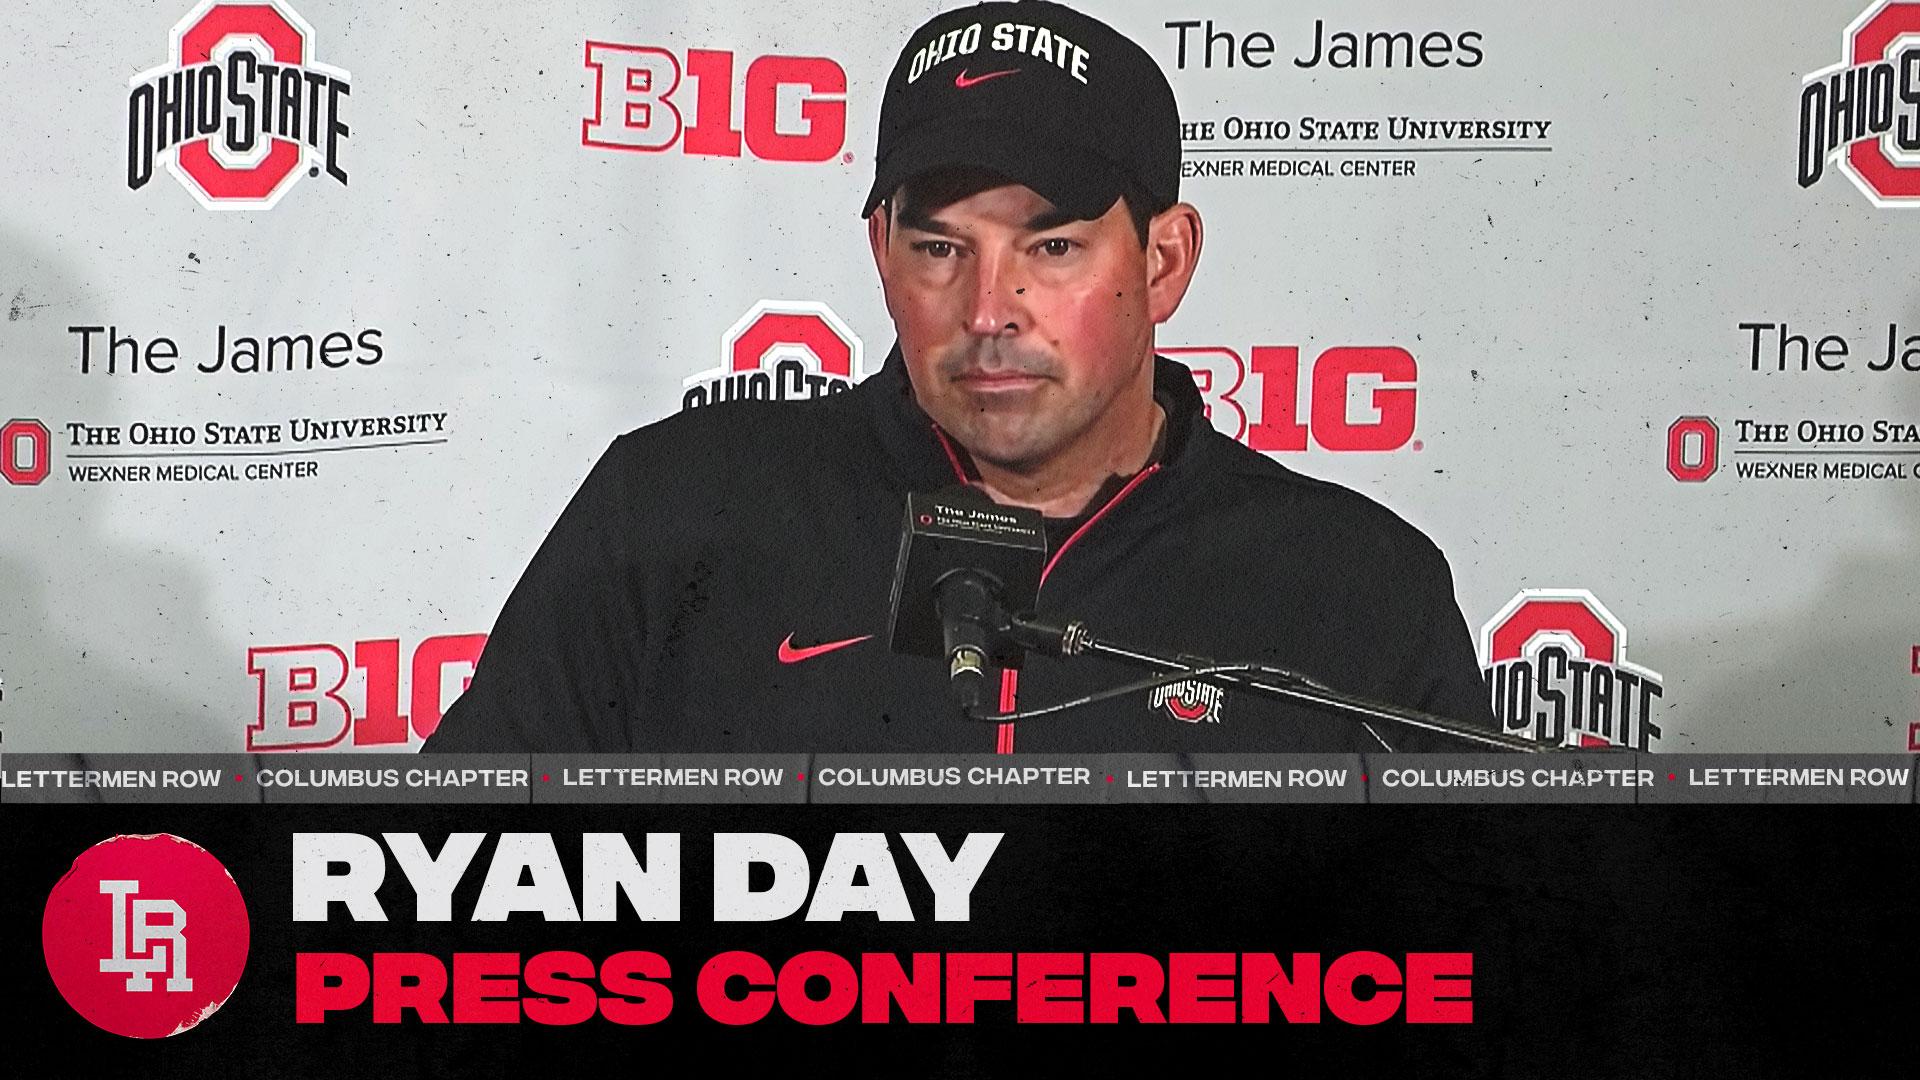 Ryan-Day-Press-Conference-ryan-day-presser-post-rutgers